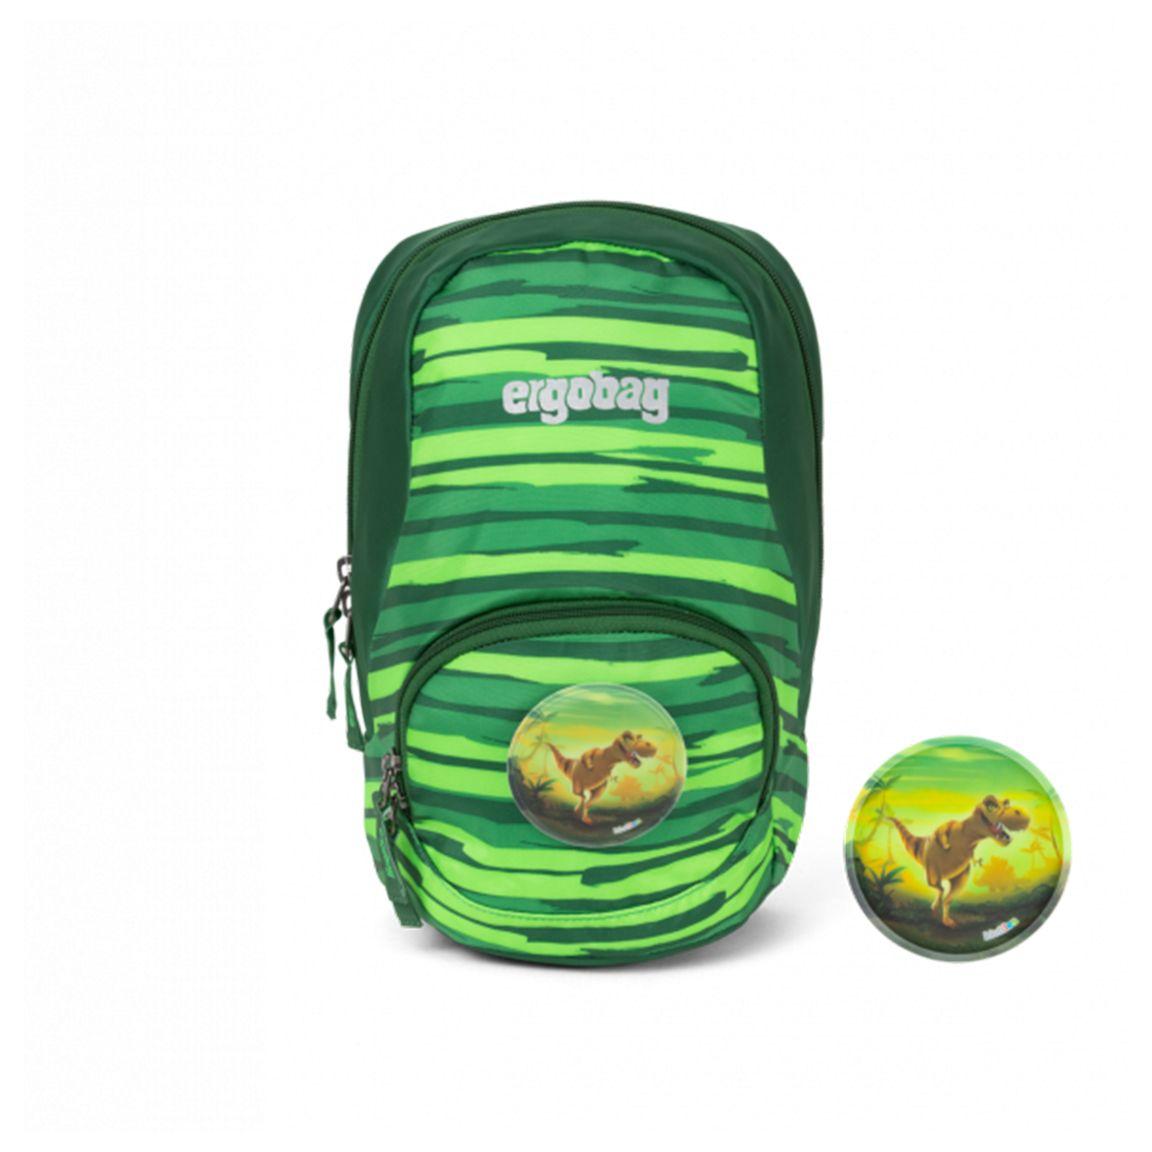 Ergobag Kinder Rucksack ease Small 6l Dschungel ERG/MIS/001/9Z9